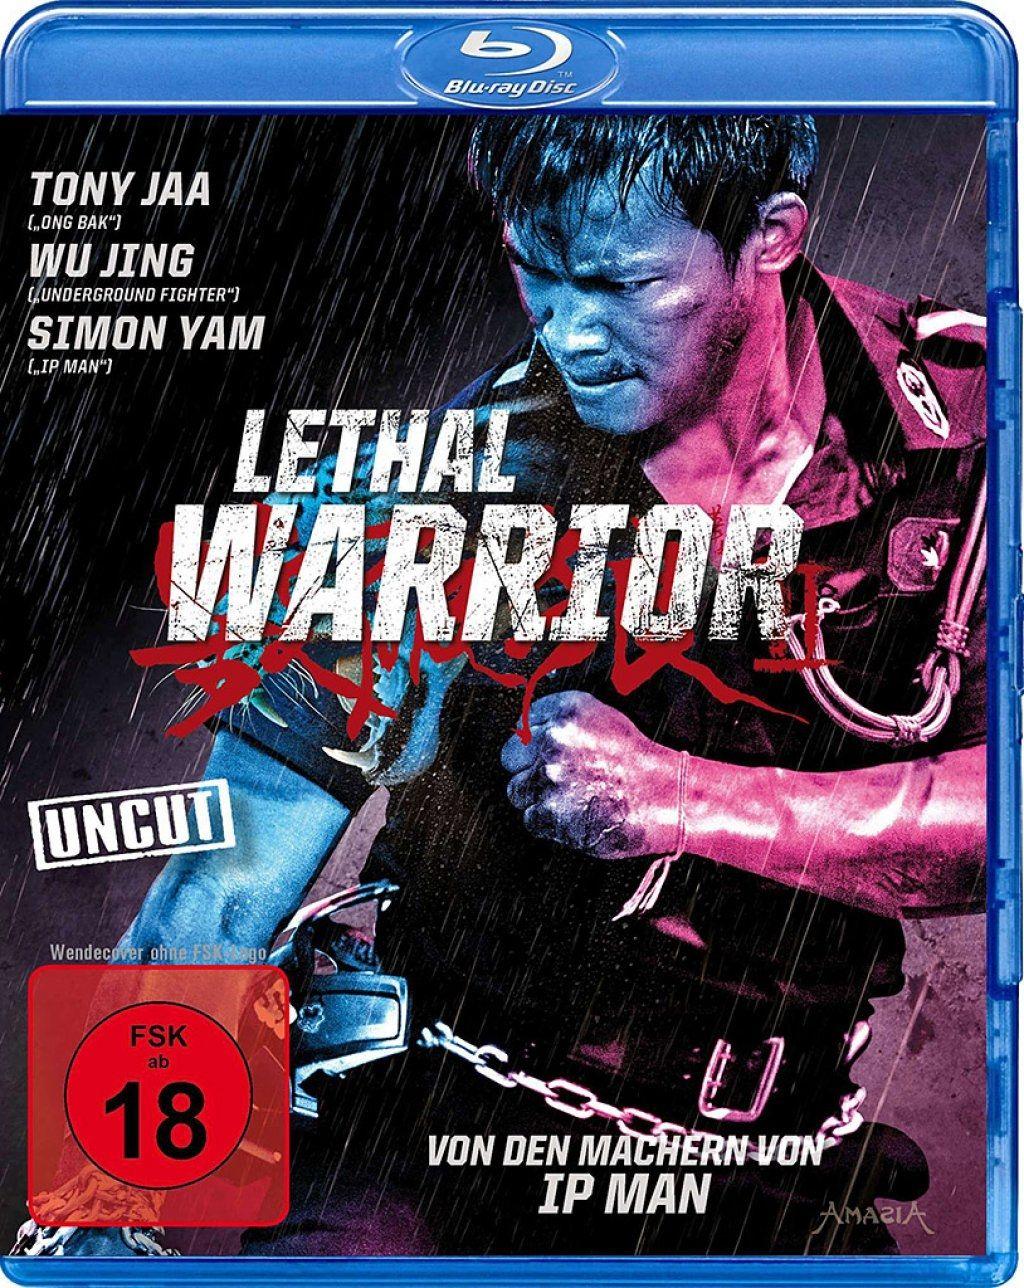 Lethal Warrior (Uncut) (BLURAY)